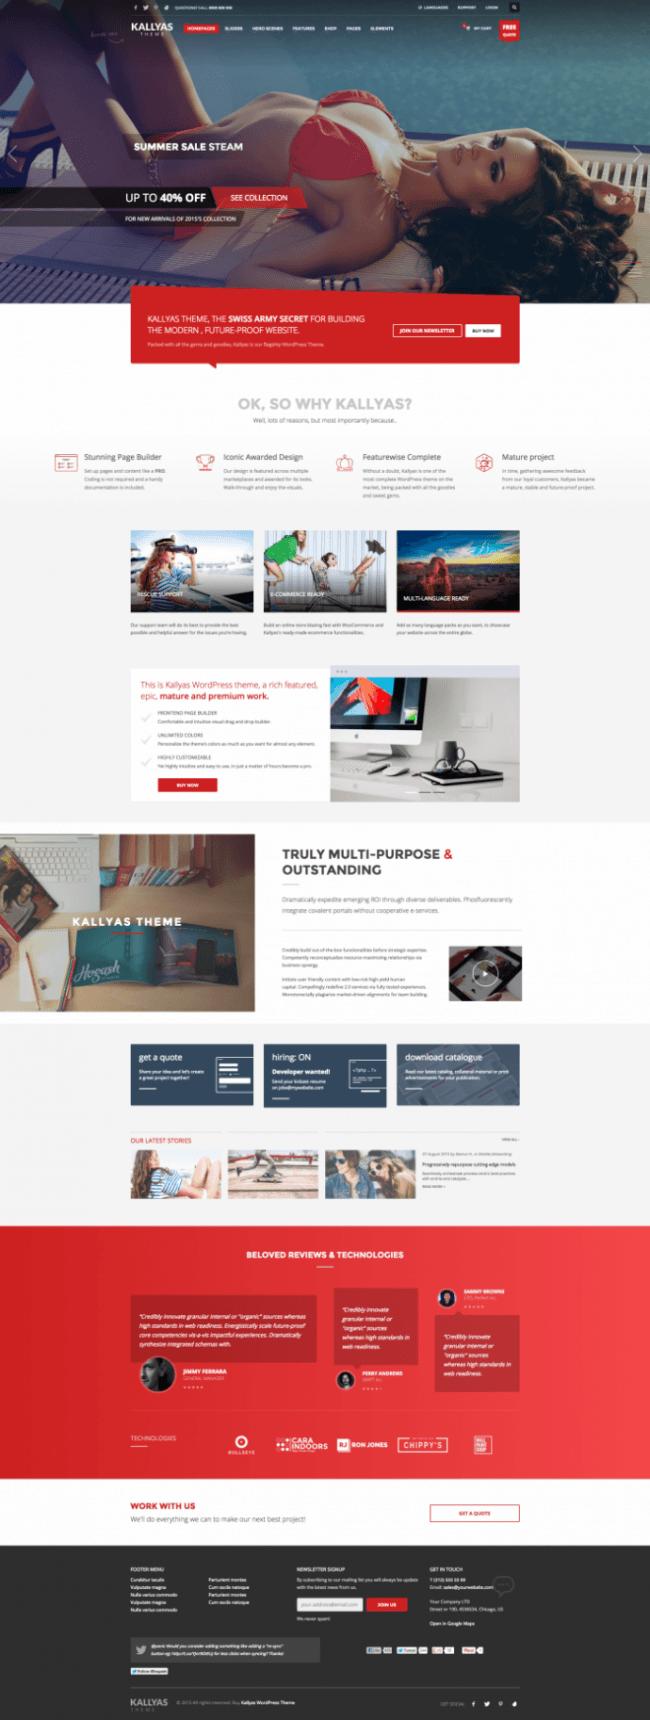 kallyas-tienda-online-wordpress